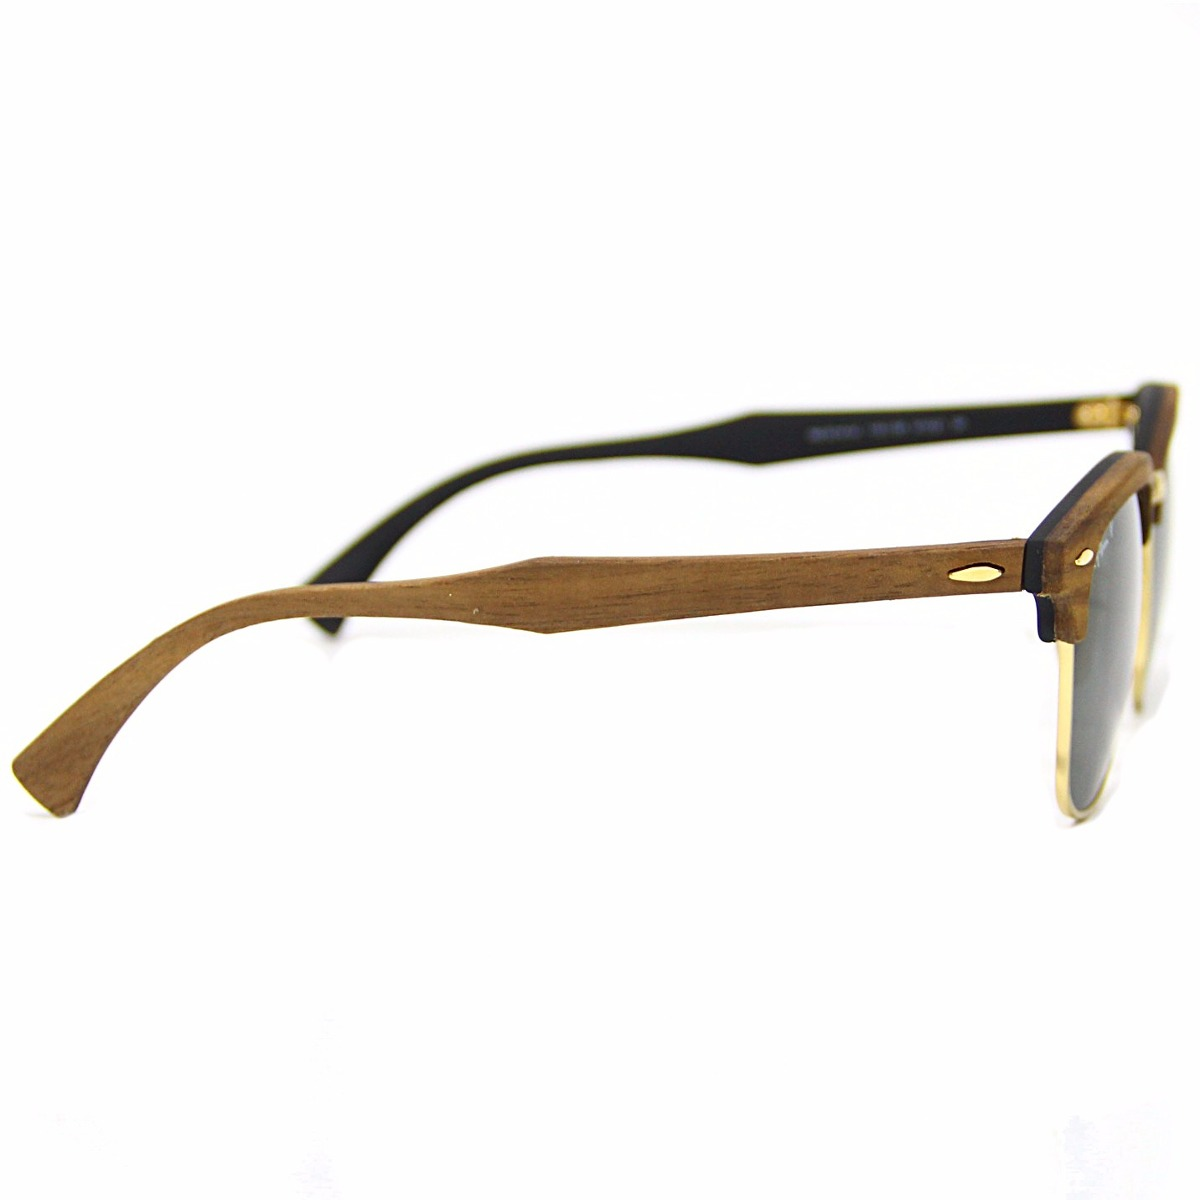 ac8af8fa4cce6 Óculos De Sol Ray Ban Clubmaster Wood Unissex Polarizado Len - R ...